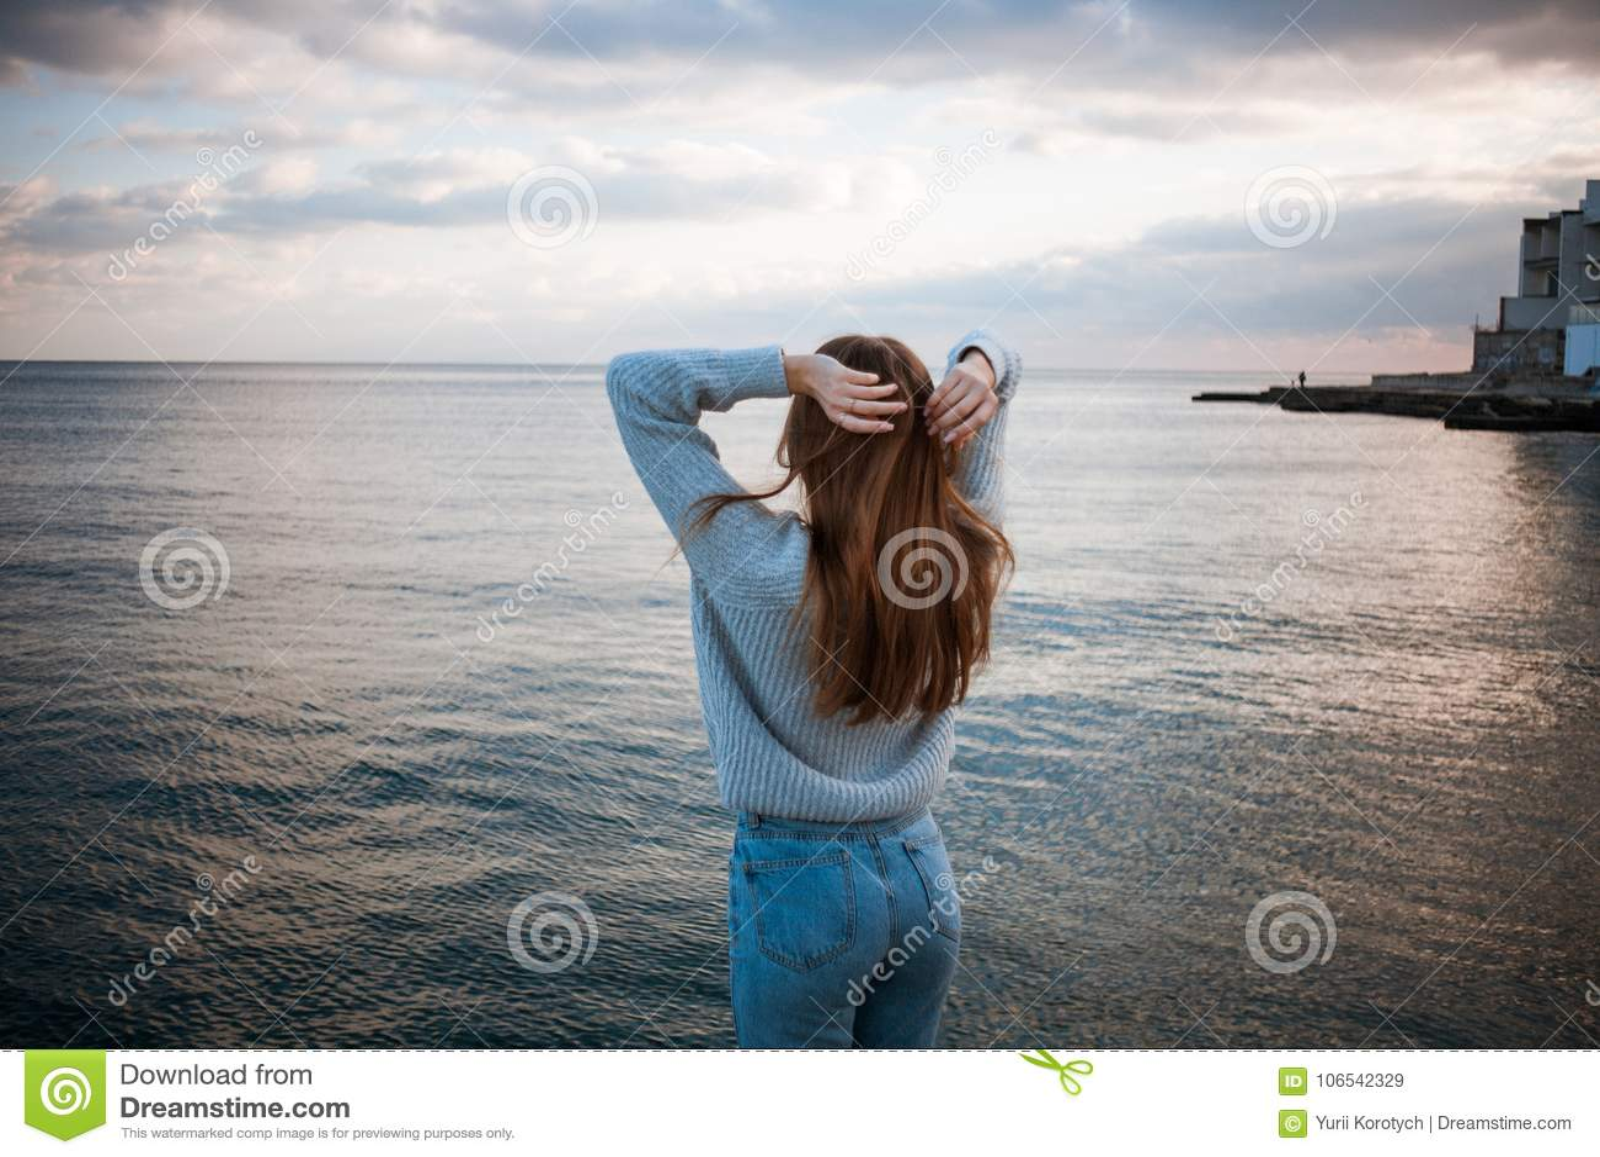 531cdd58834a Το κορίτσι γύρισε μακρυά από τη κάμερα που στέκεται σε ένα πουλόβερ κοντά  στη θάλασσα